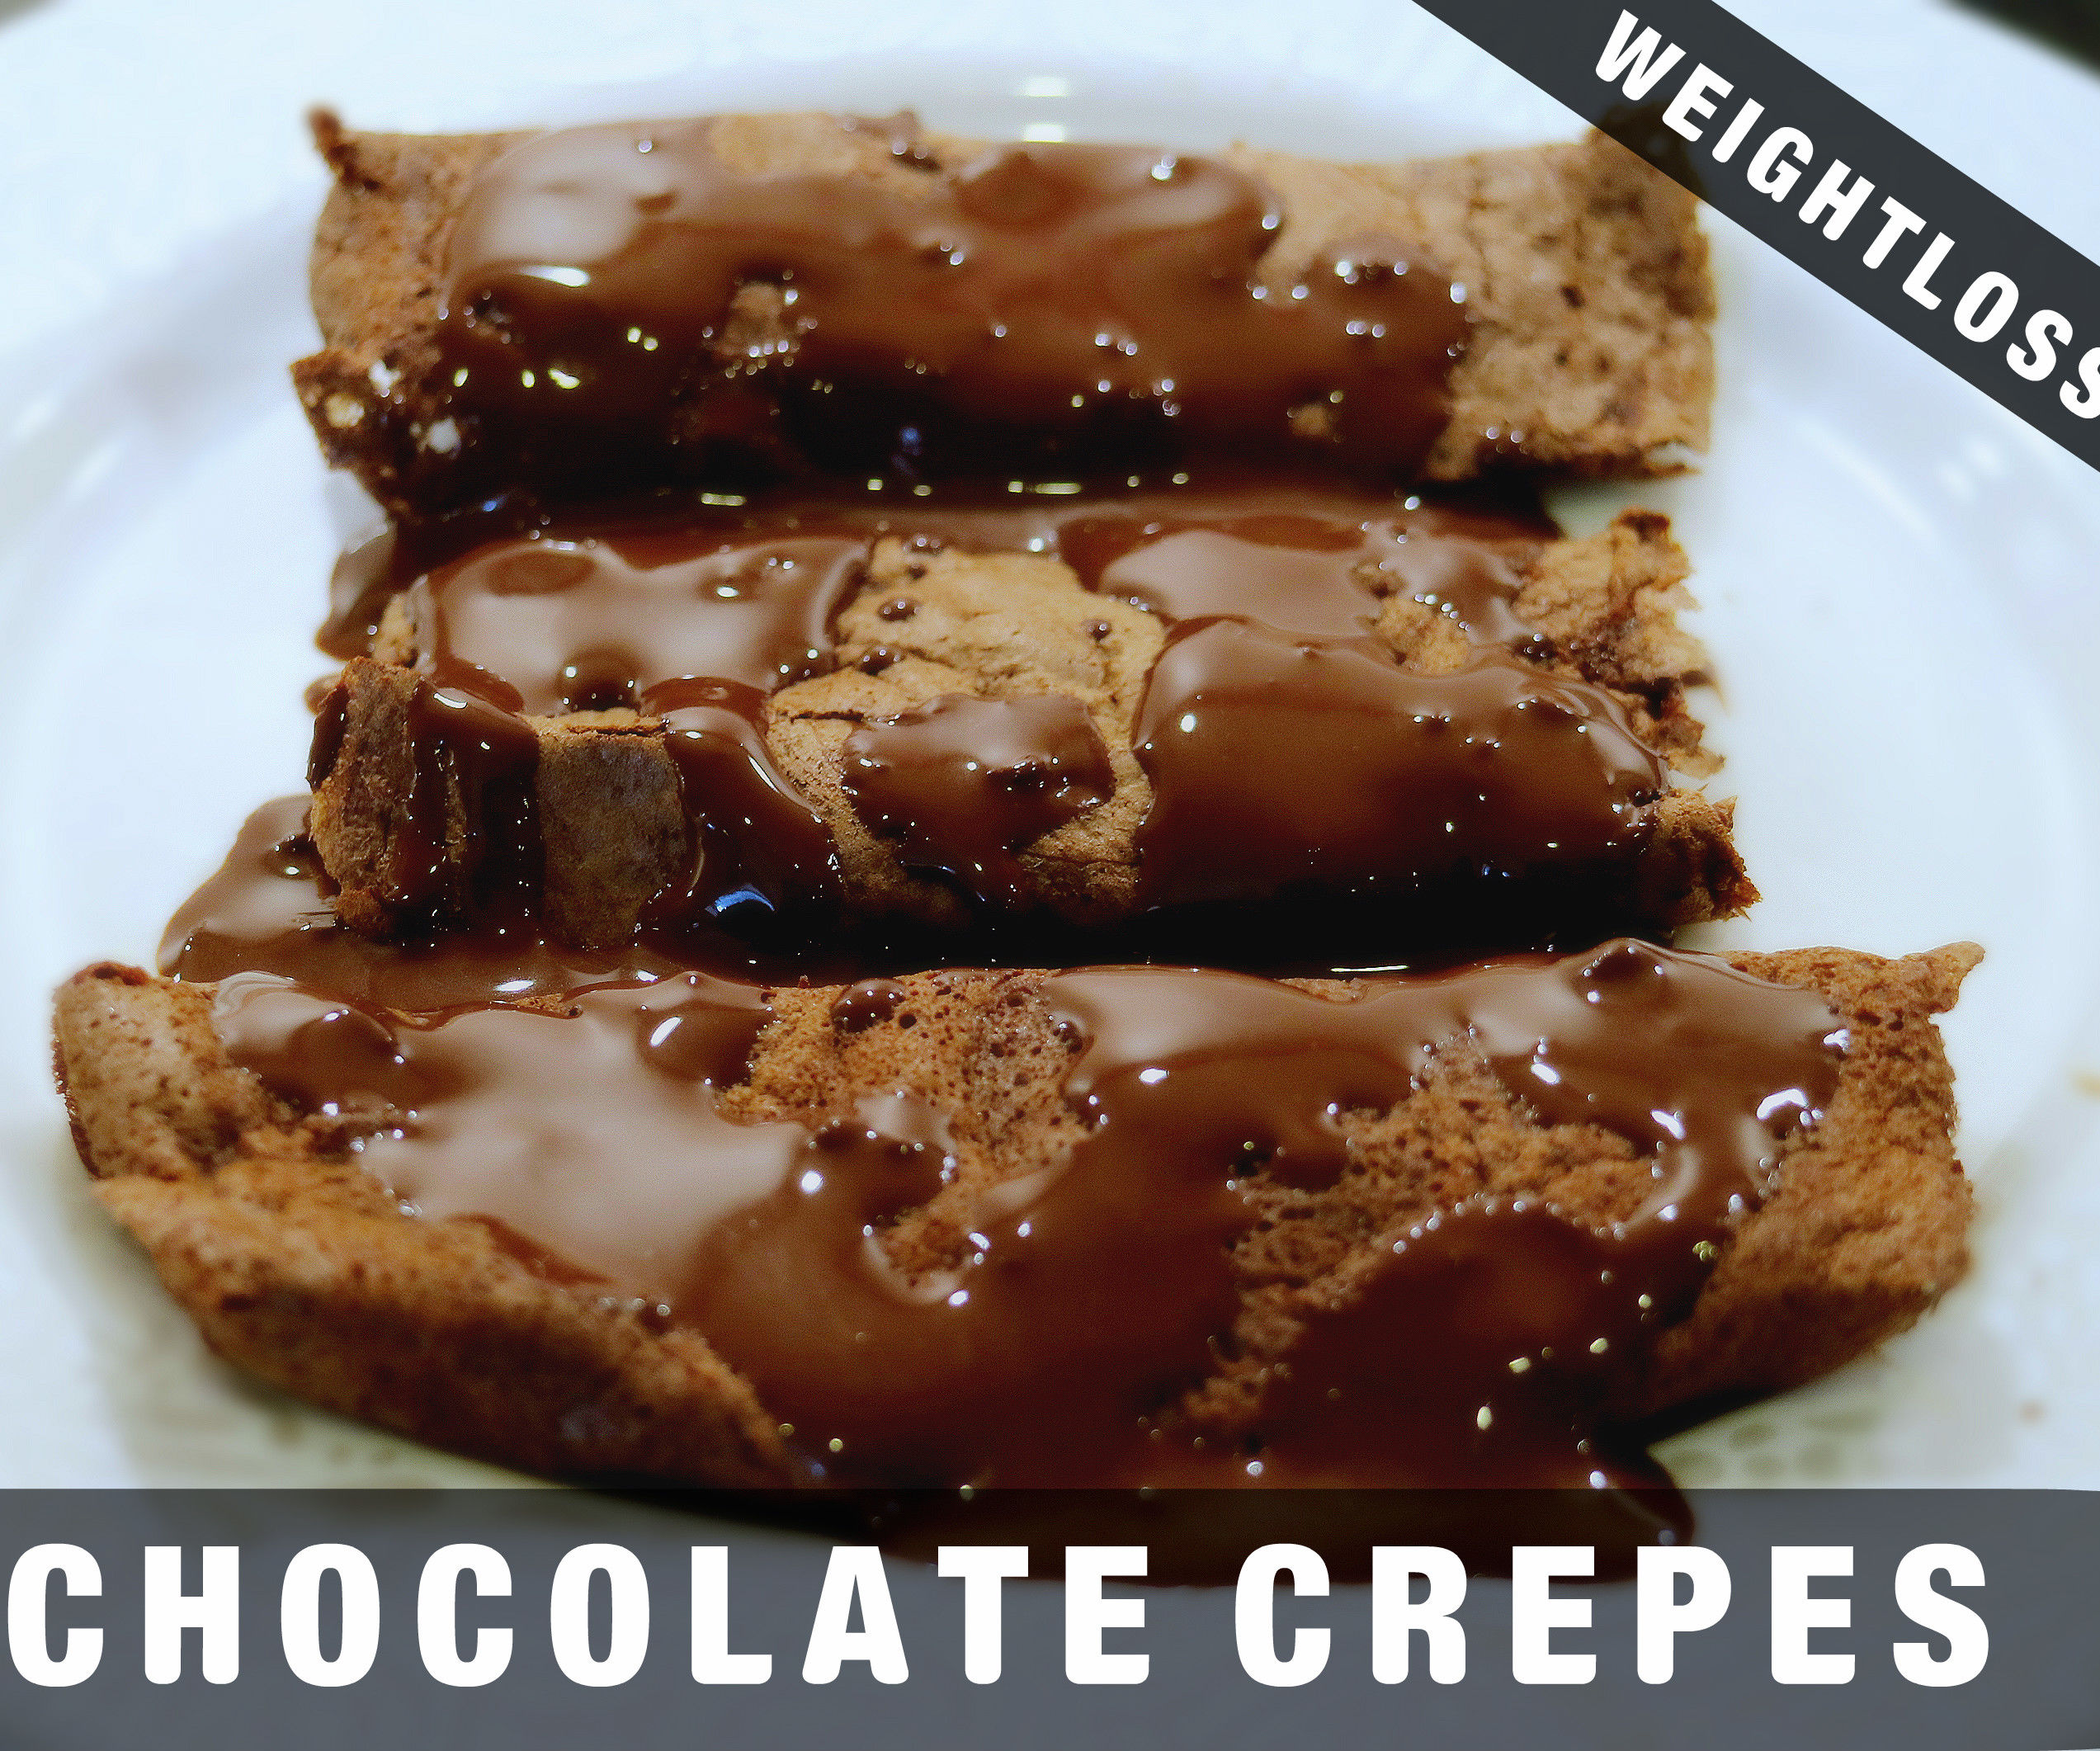 HEALTHY DARK CHOCOLATE CREPES